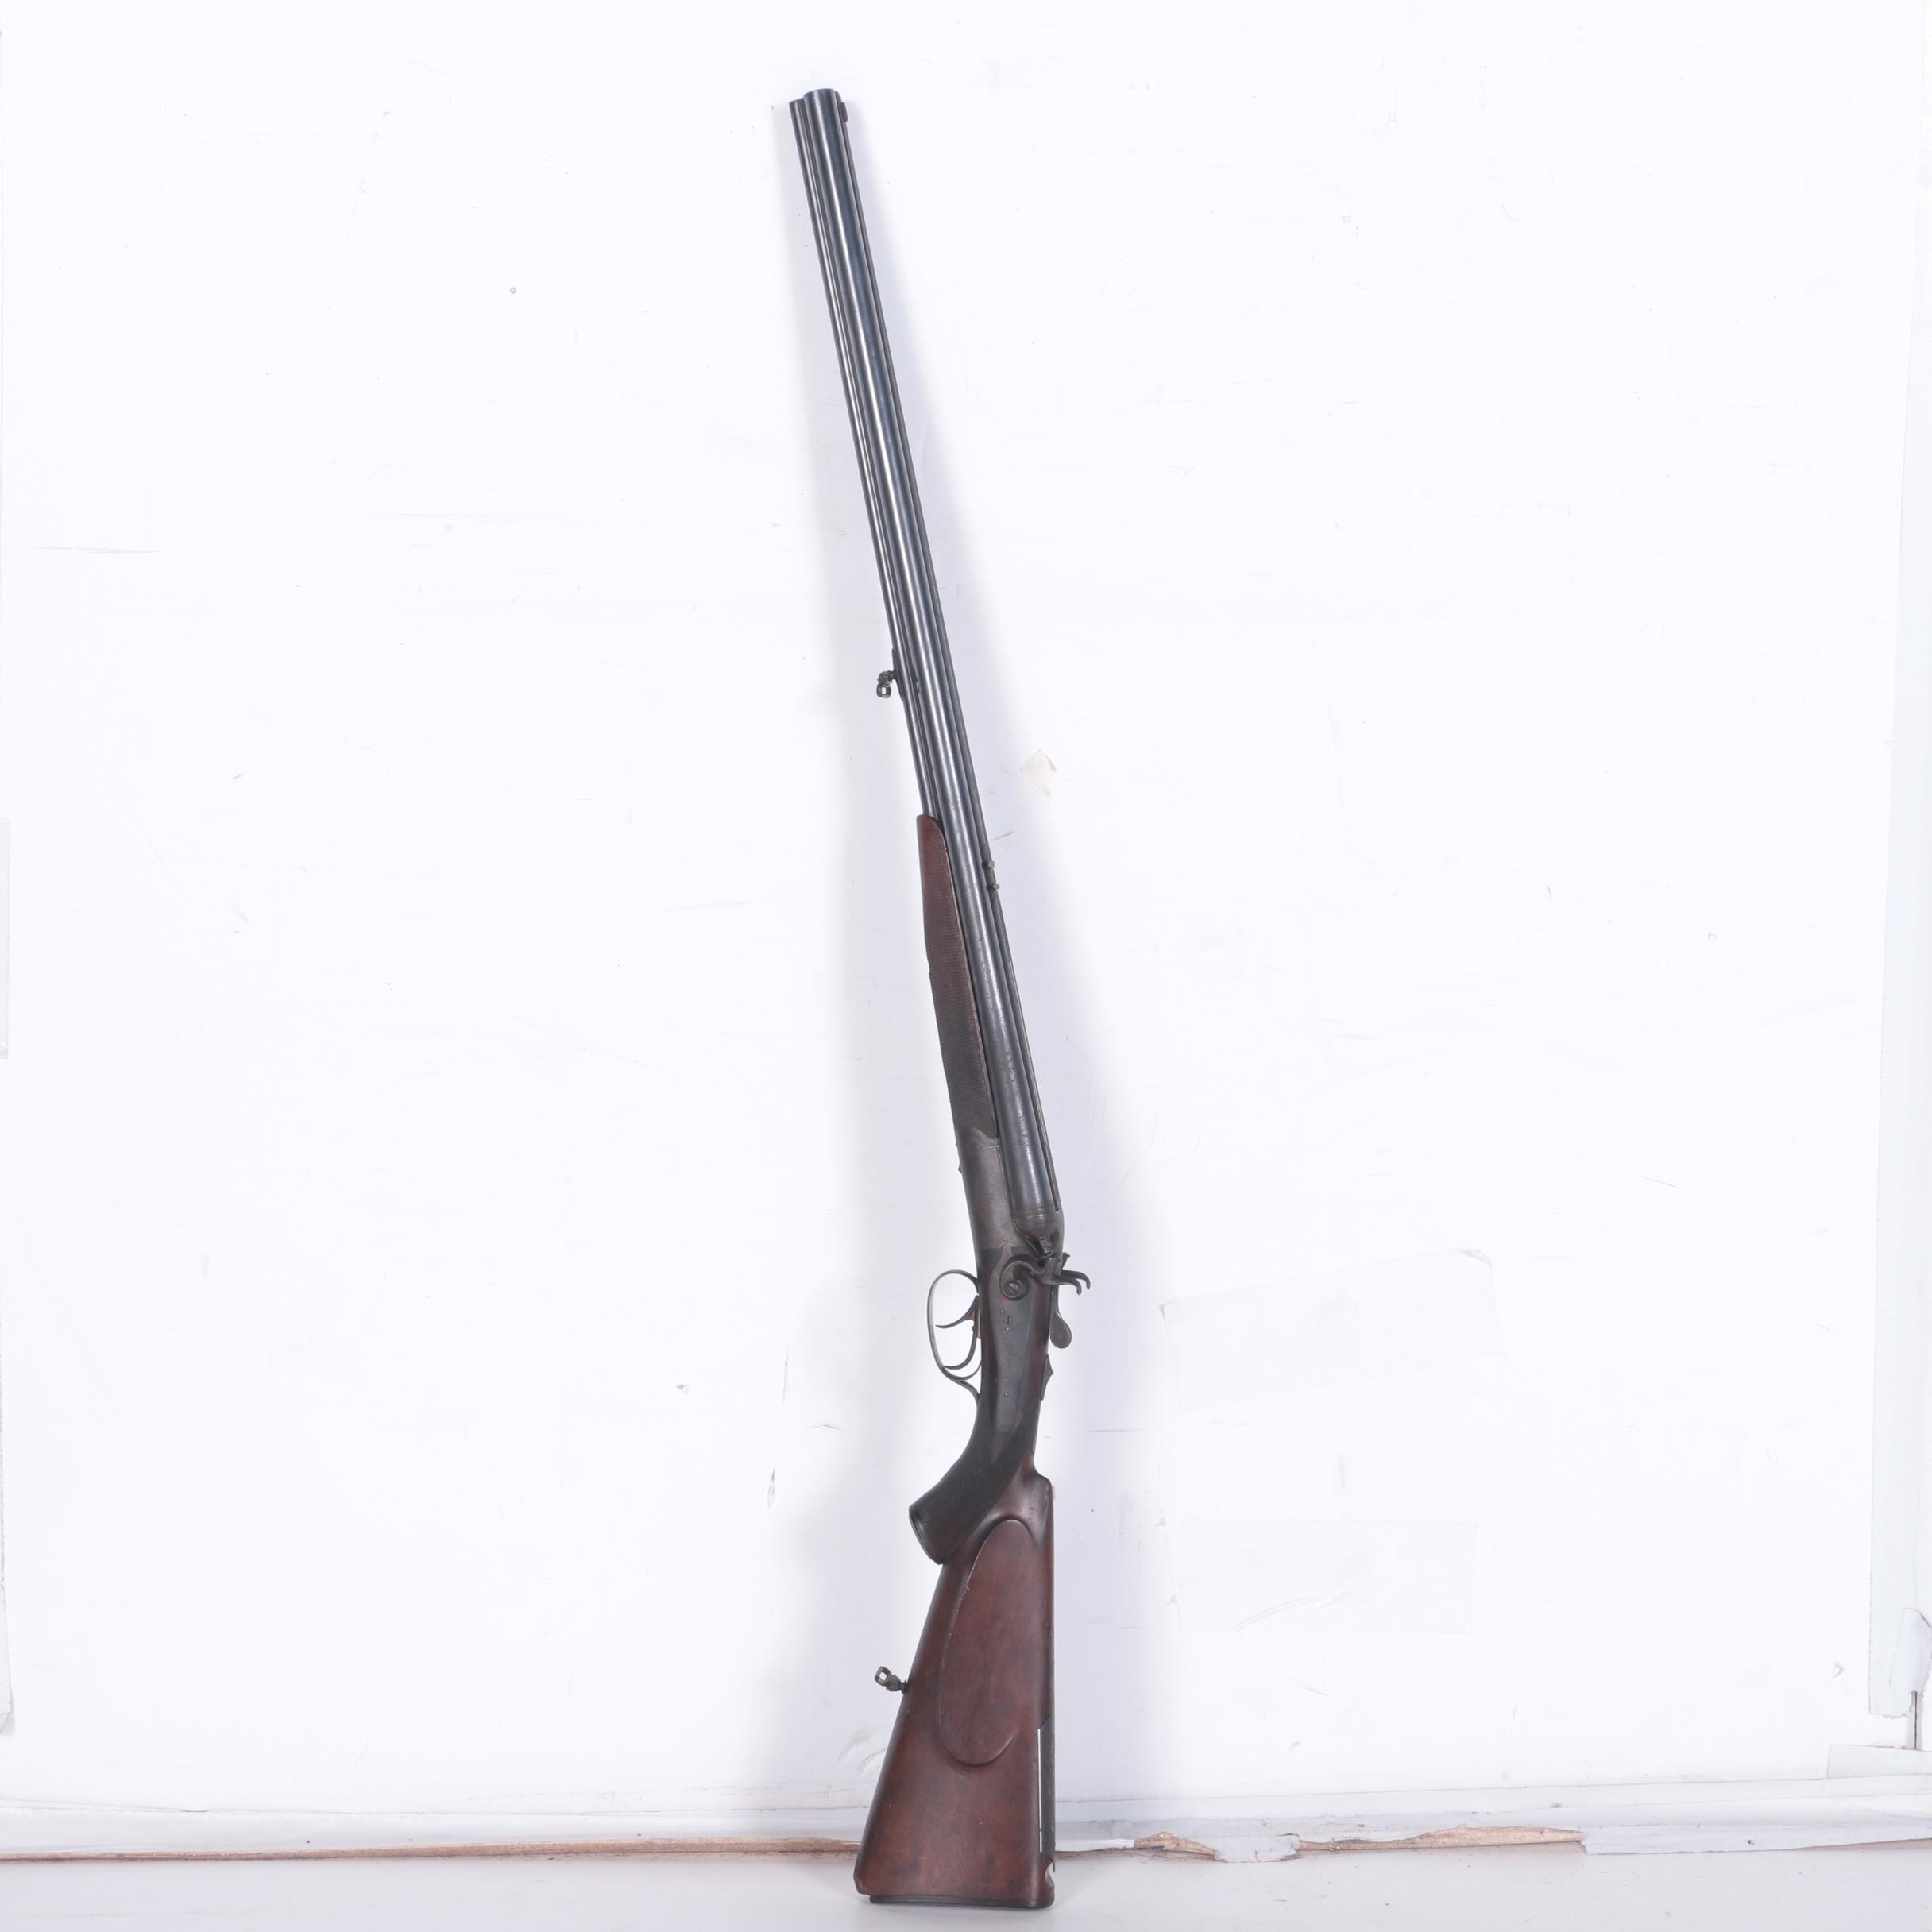 Antique Wilhelm Brenneke Double-Barrel Percussion Rifle